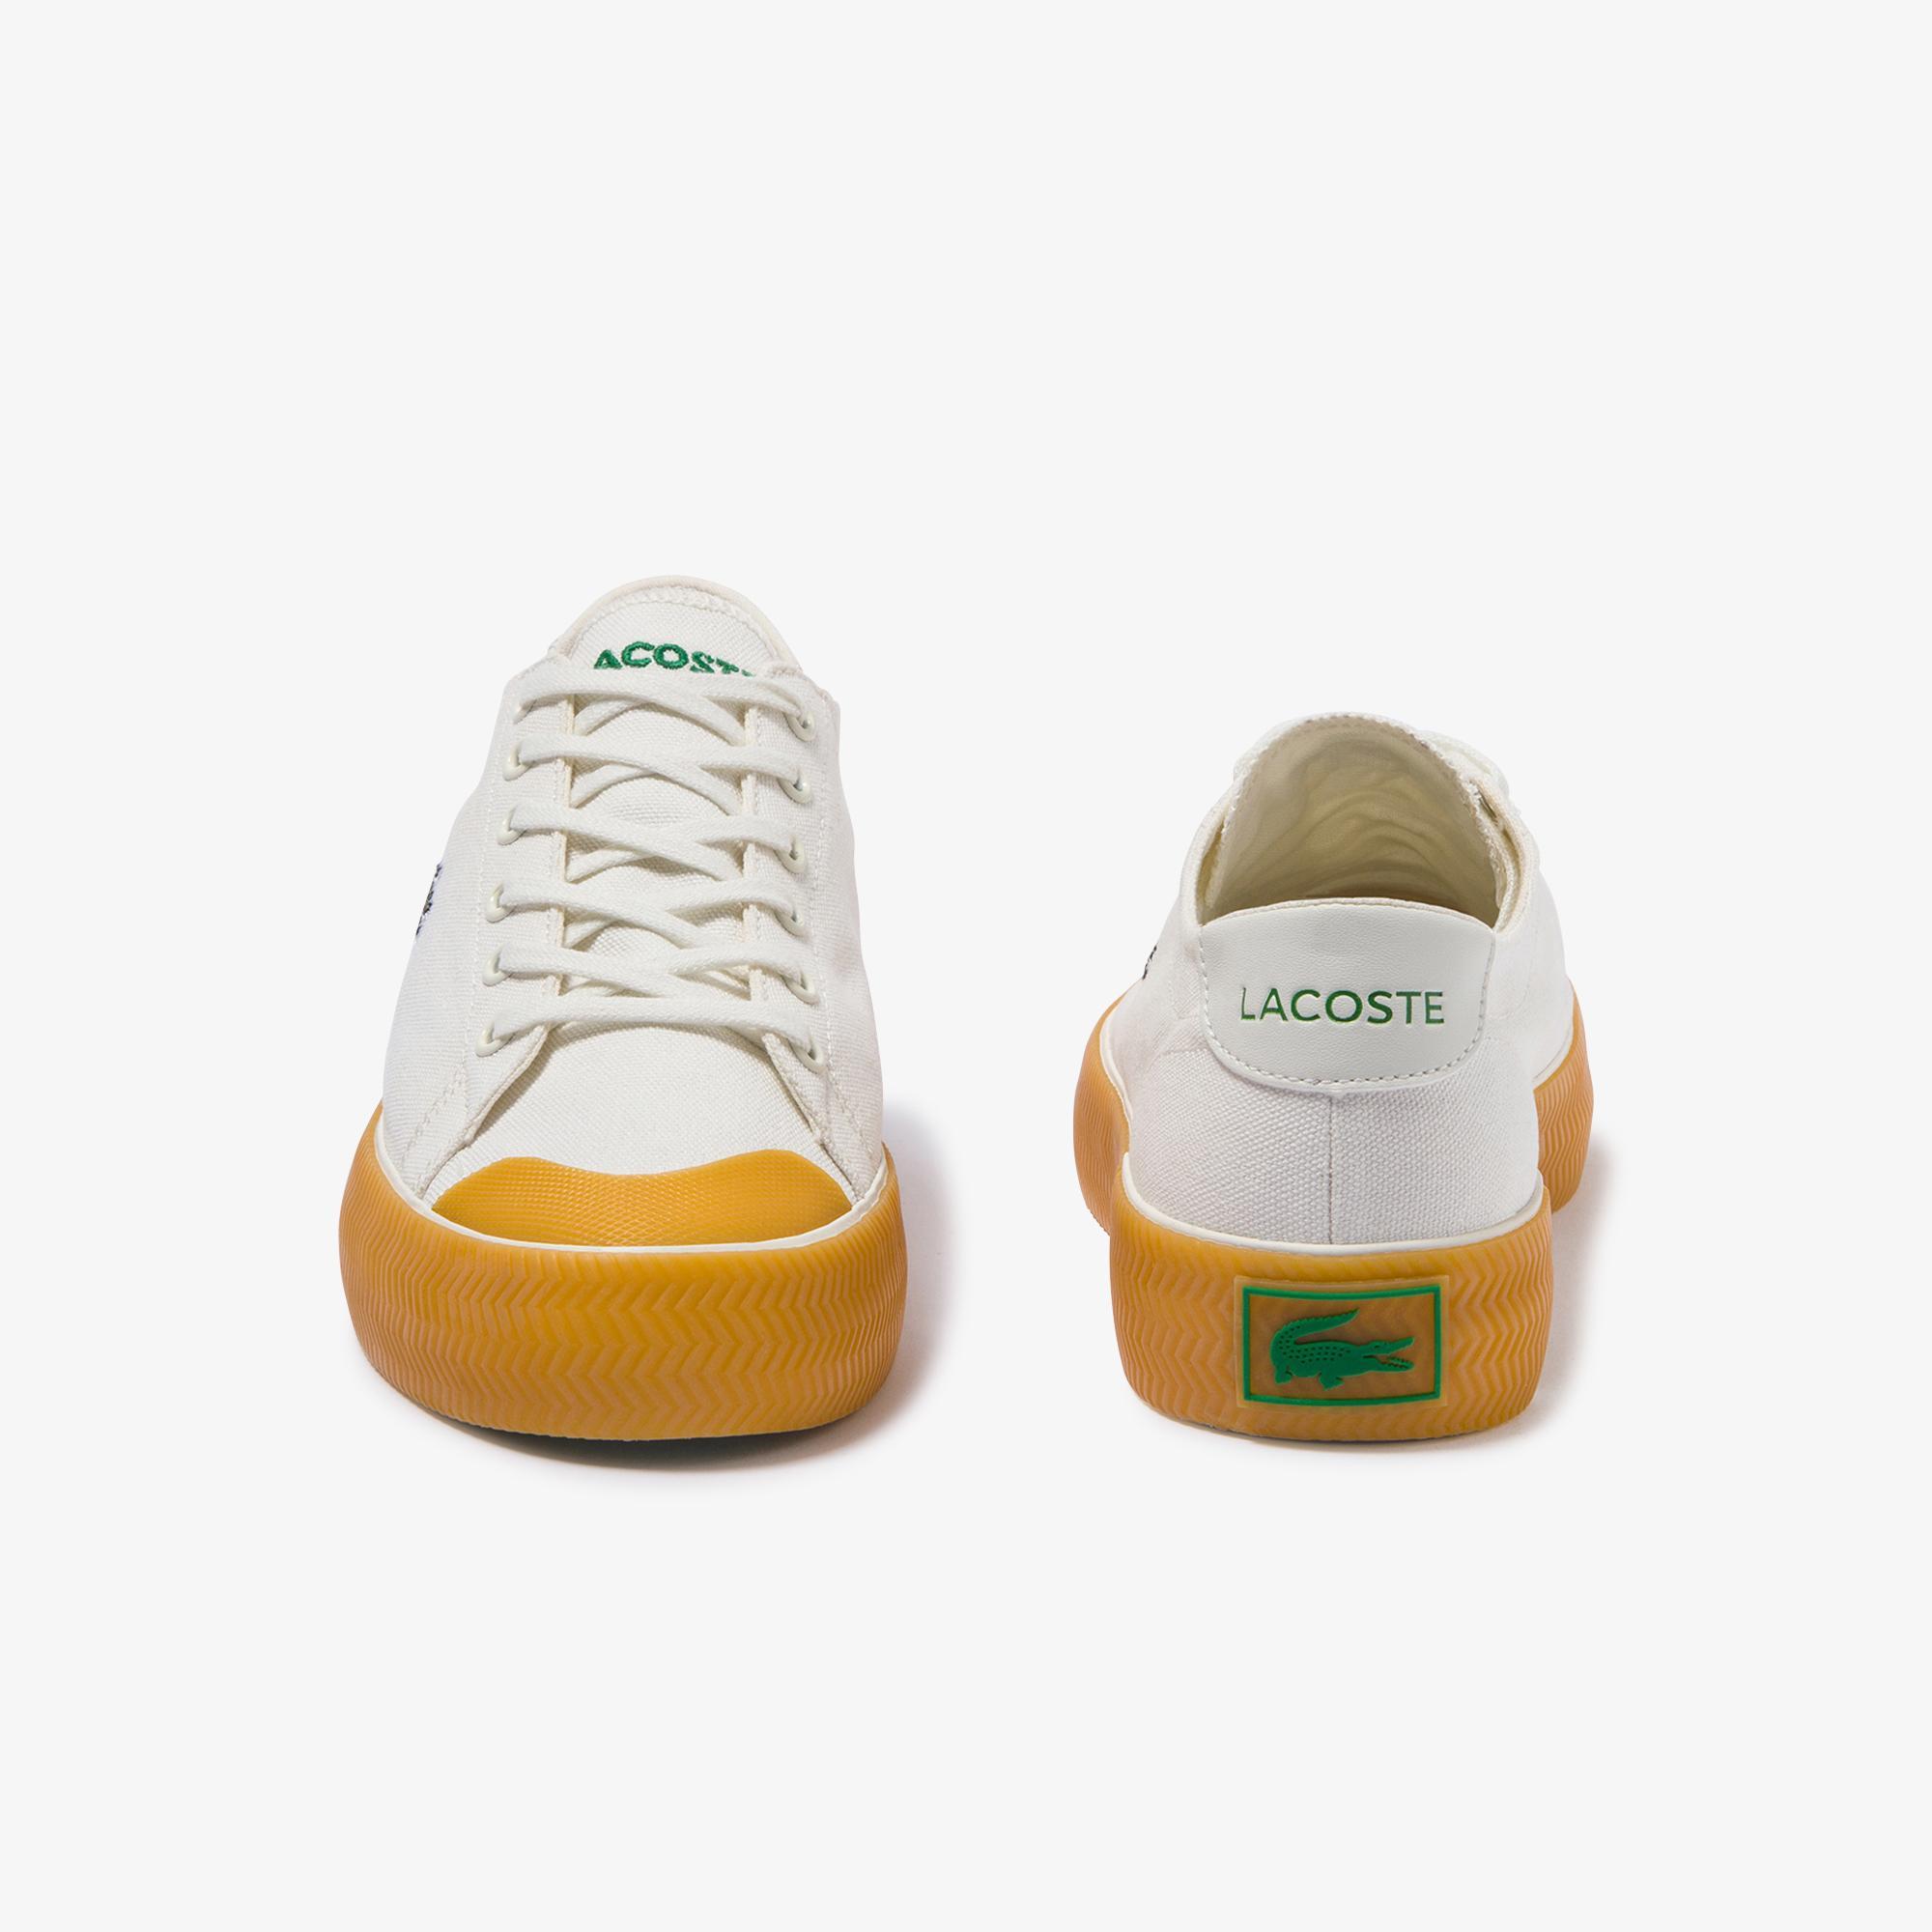 Lacoste кросівки жіночі Gripshot